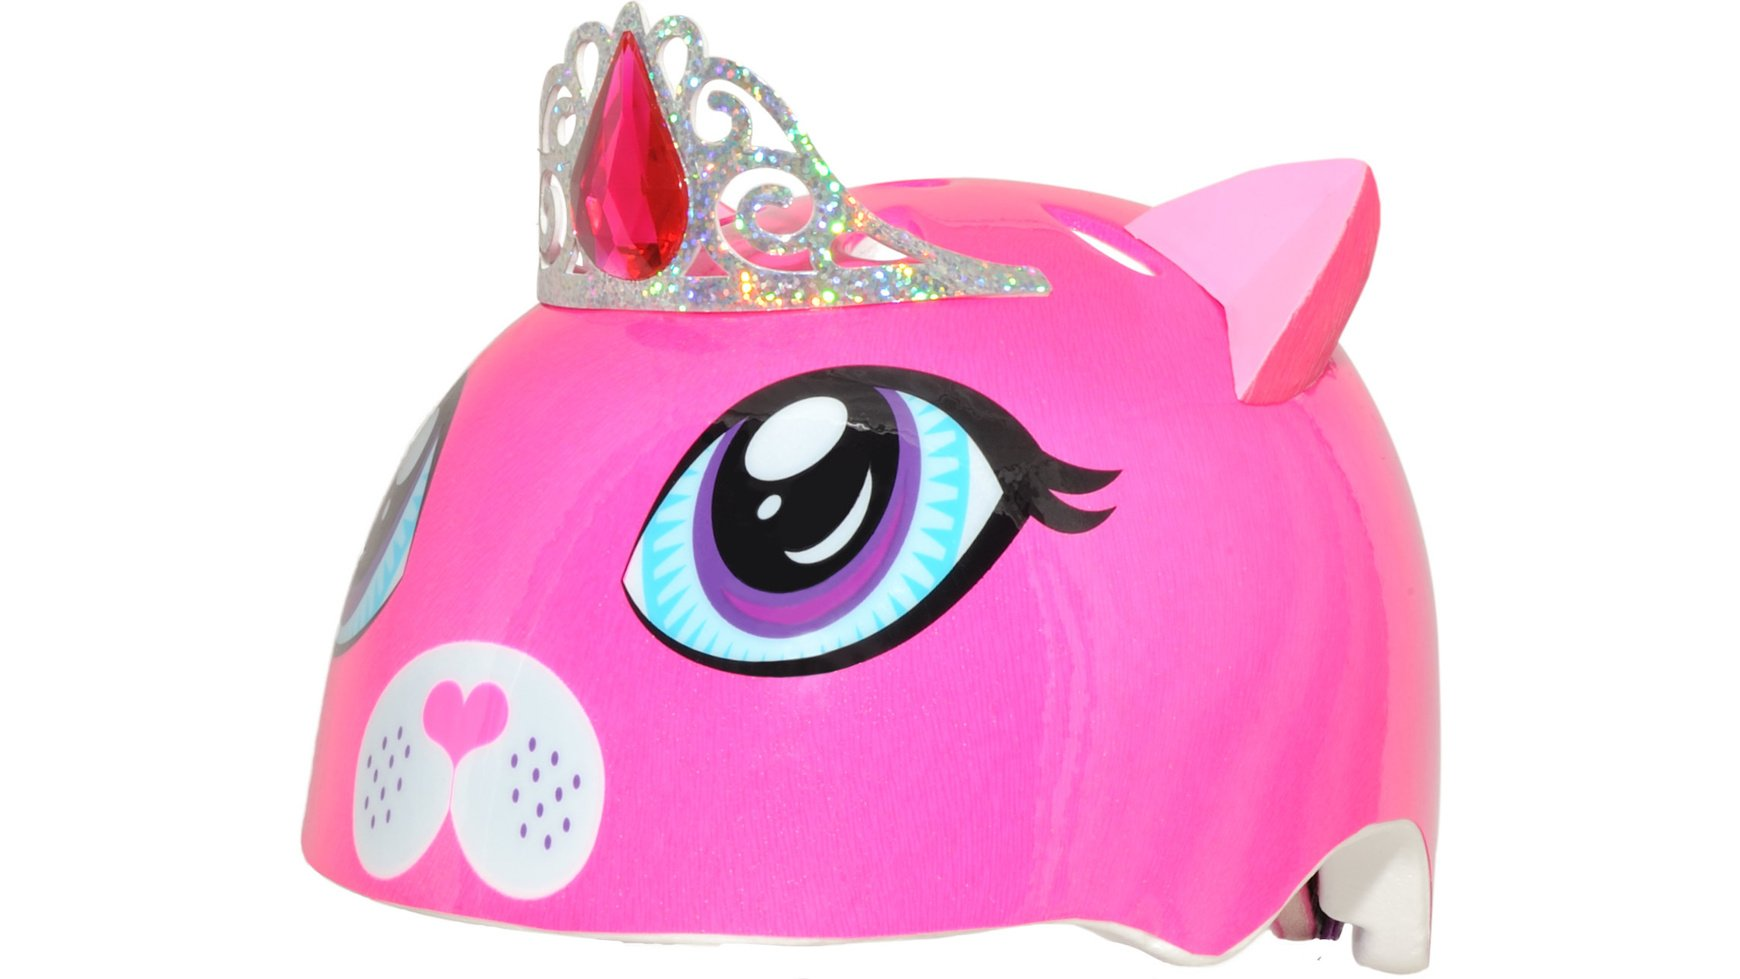 Raskullz Girls Kitty Tiara Helmet, Dark Pink, Ages 5+